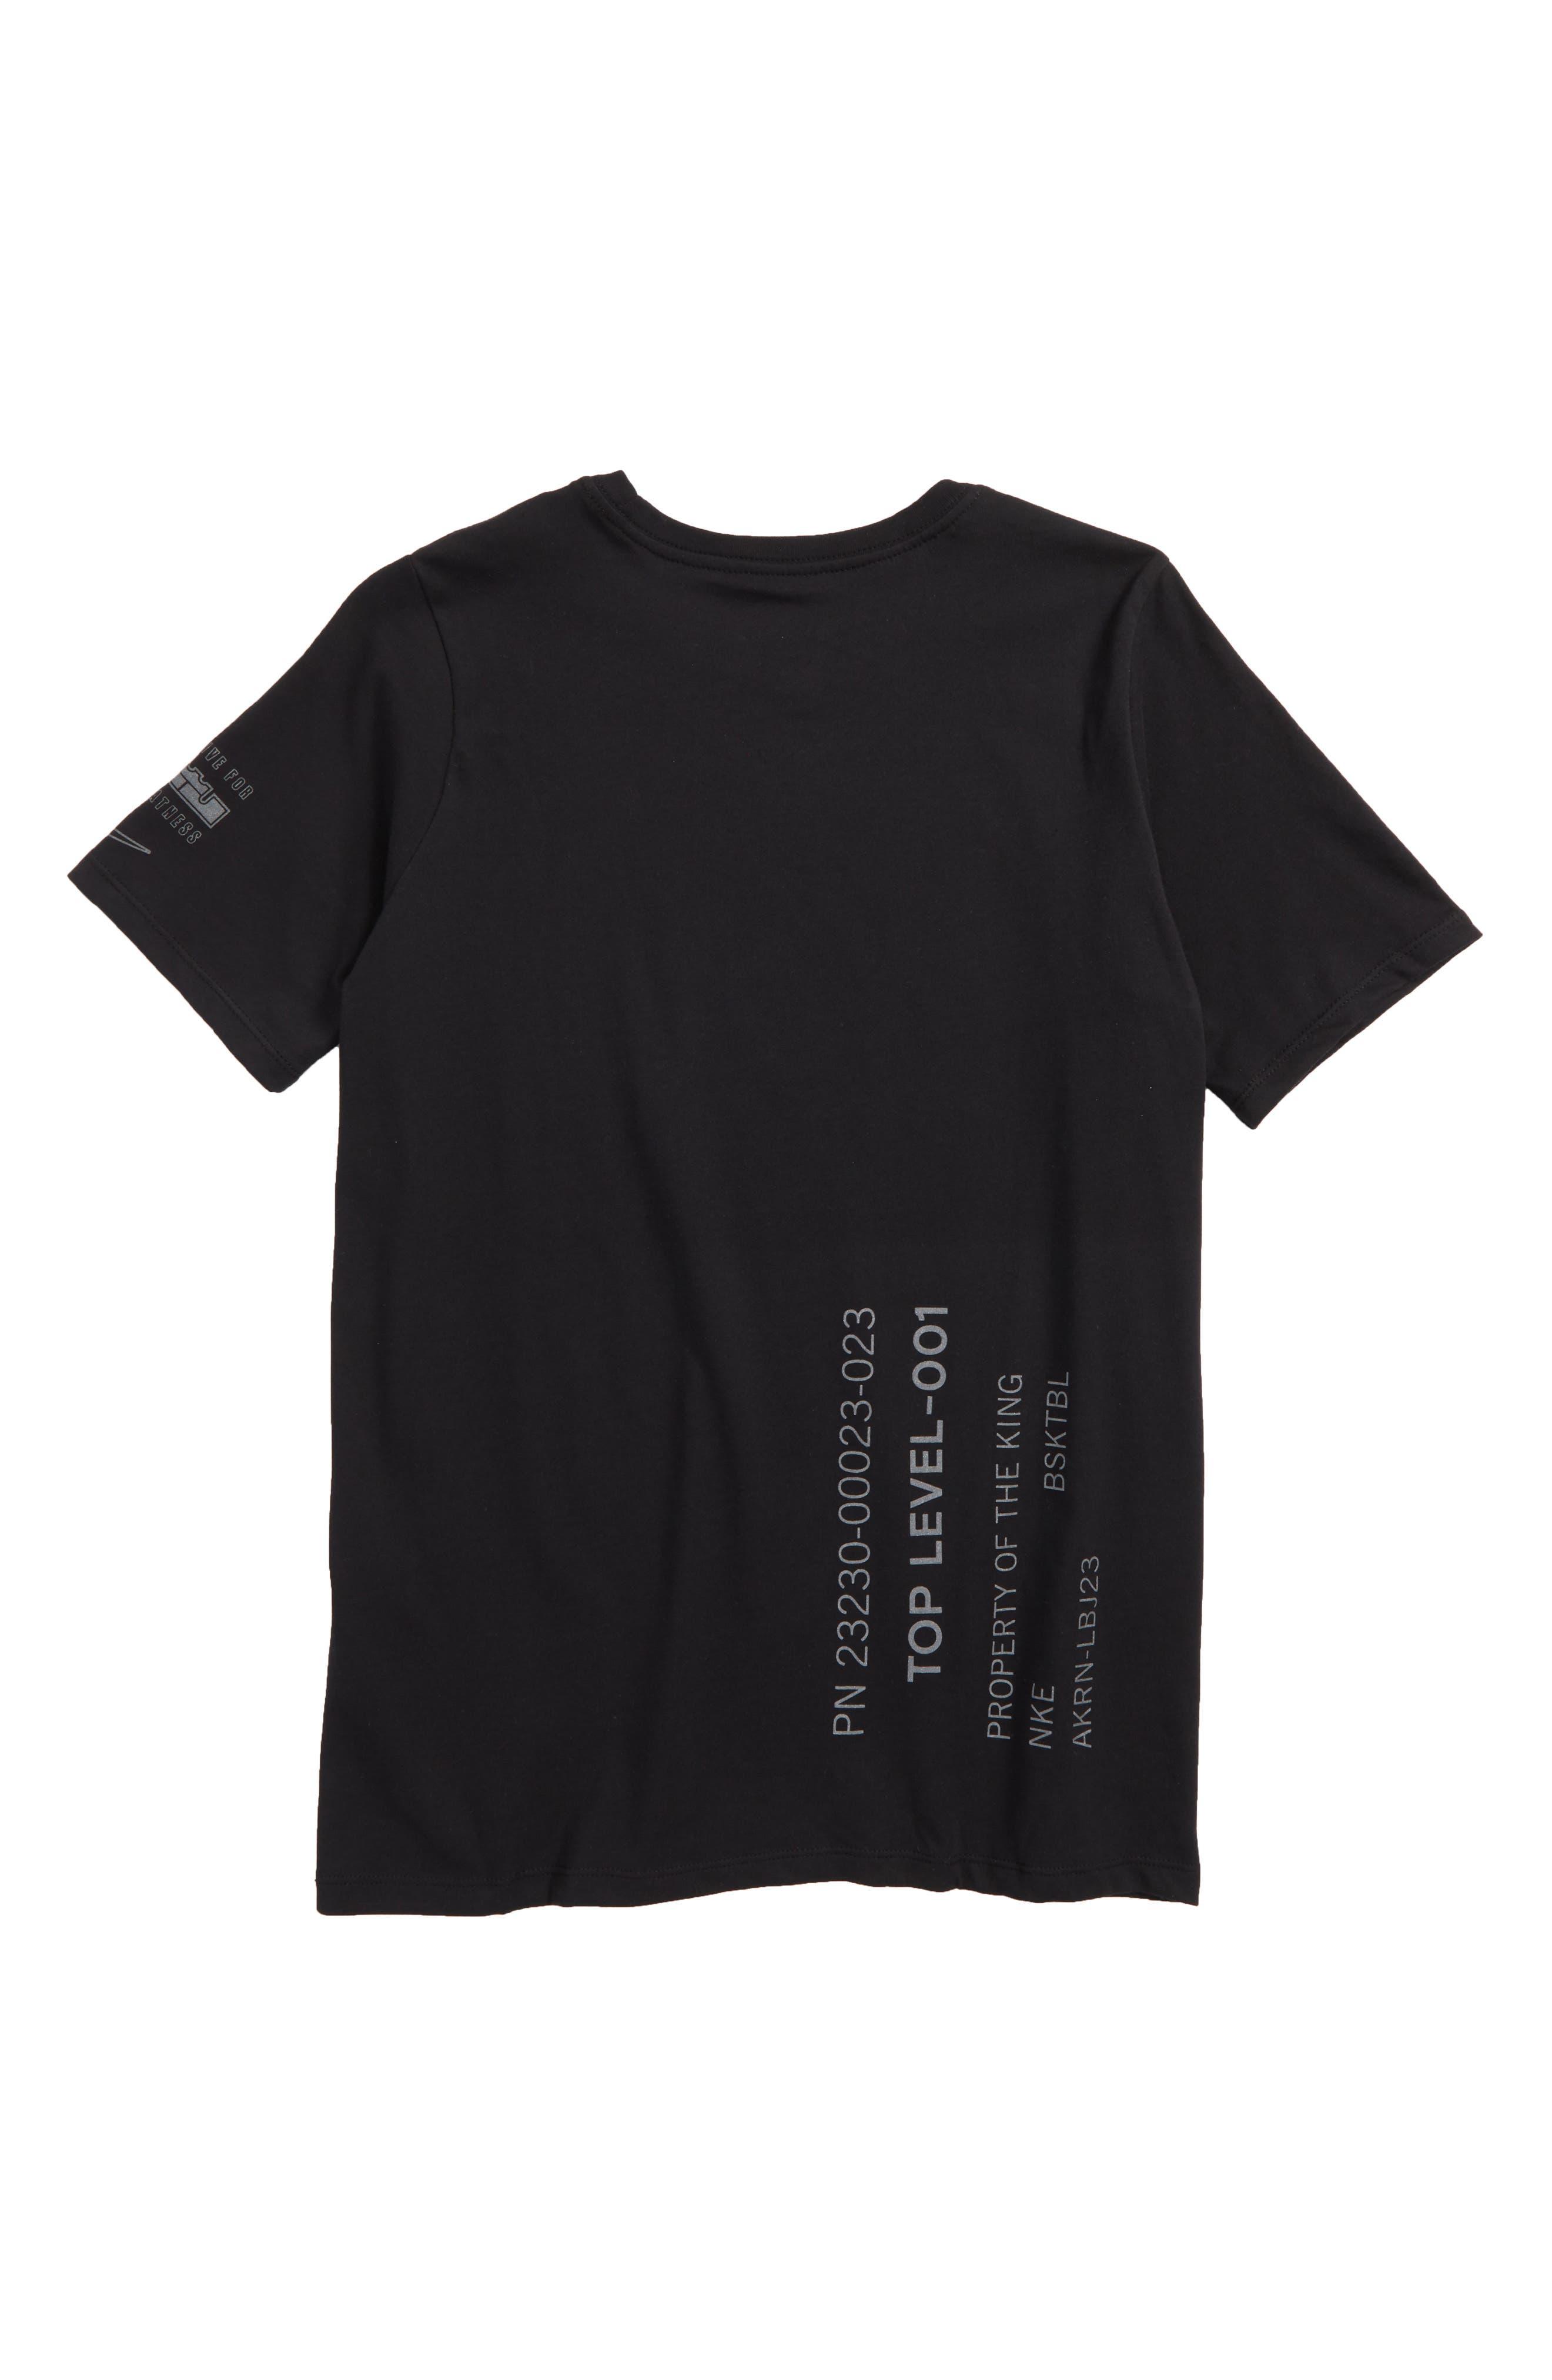 Dry Dark 23 Graphic T-Shirt,                             Alternate thumbnail 2, color,                             010